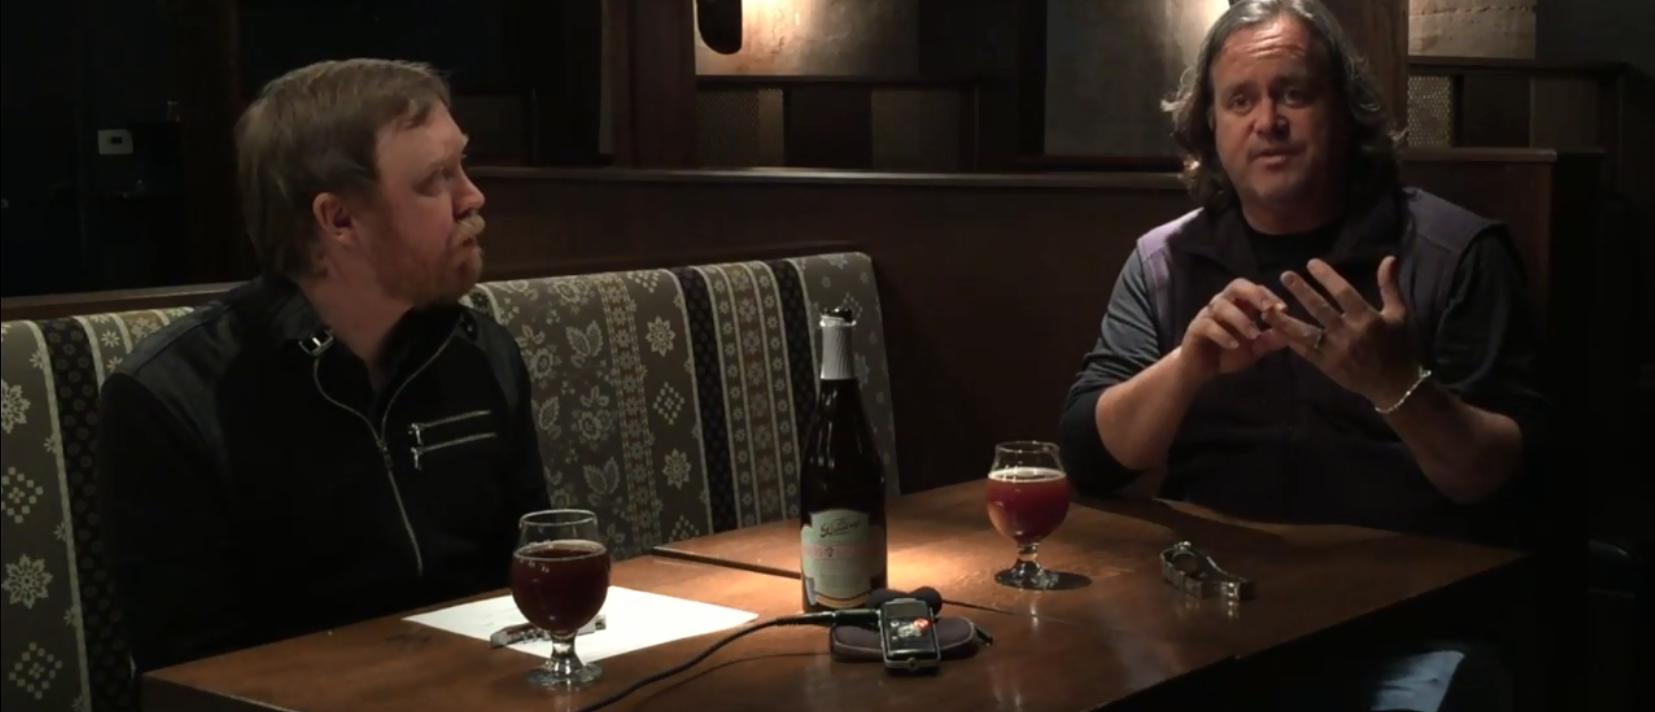 Beer Of The Week: The Bruery Mash & Spumoni Bourbon Barrel-aged Barleywine photo